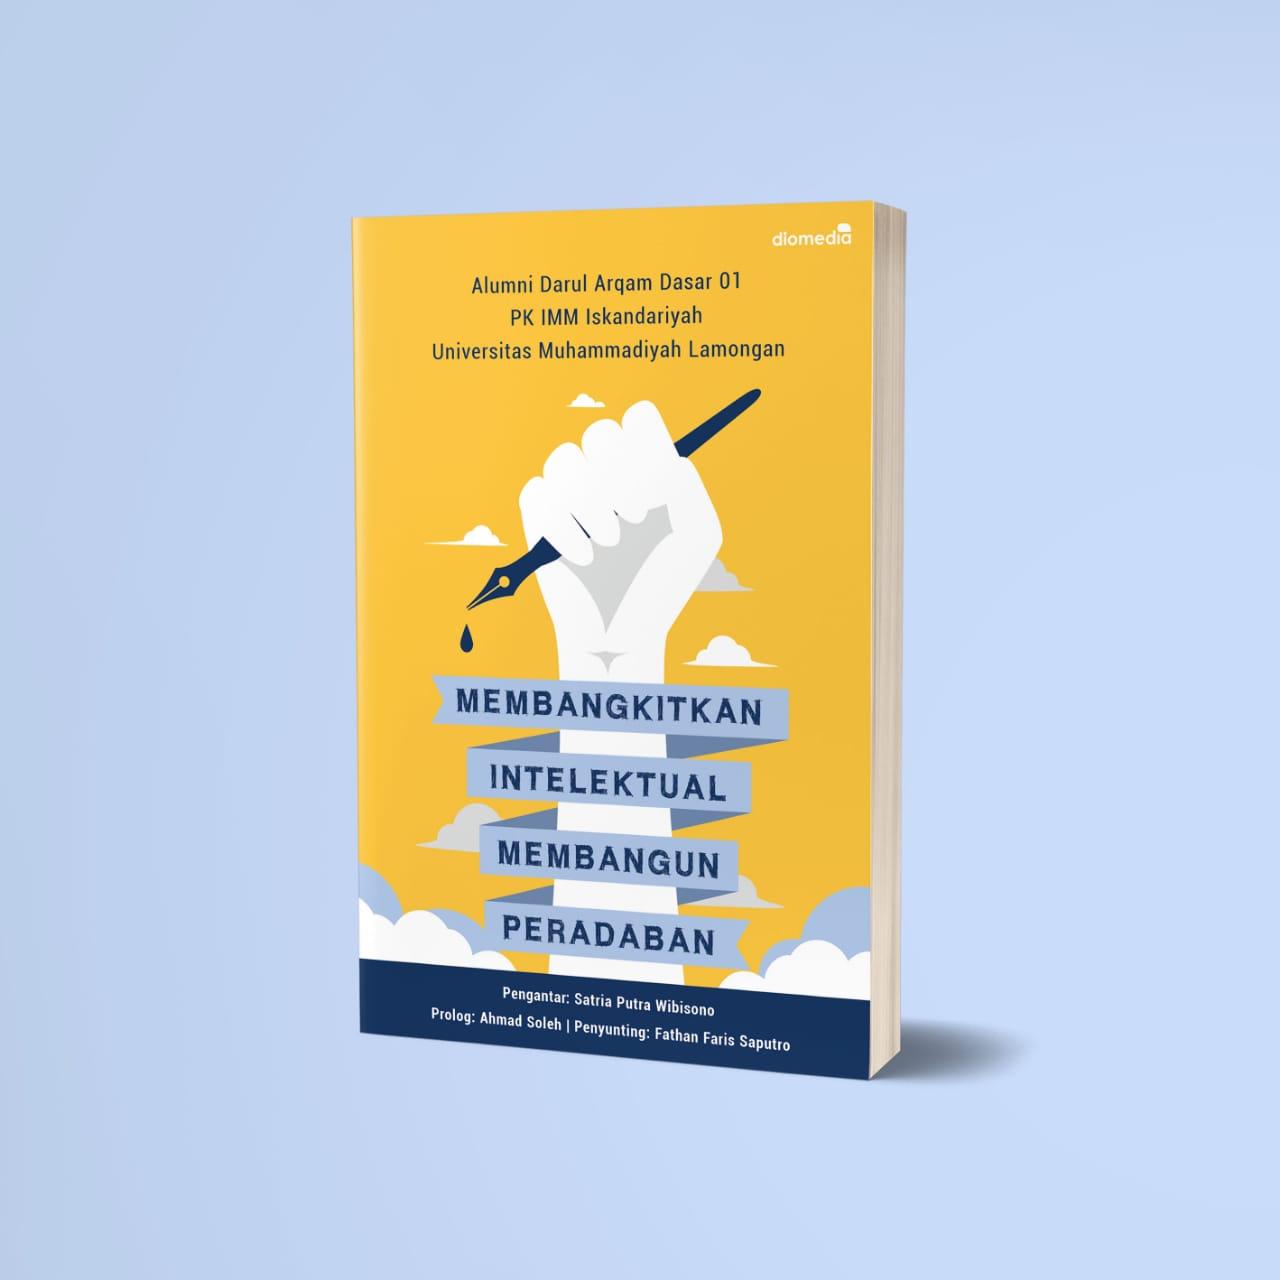 Tekuni Dunia Literasi, Alumni DAD 01 PK IMM Iskandariyah UMLA Terbitkan Buku